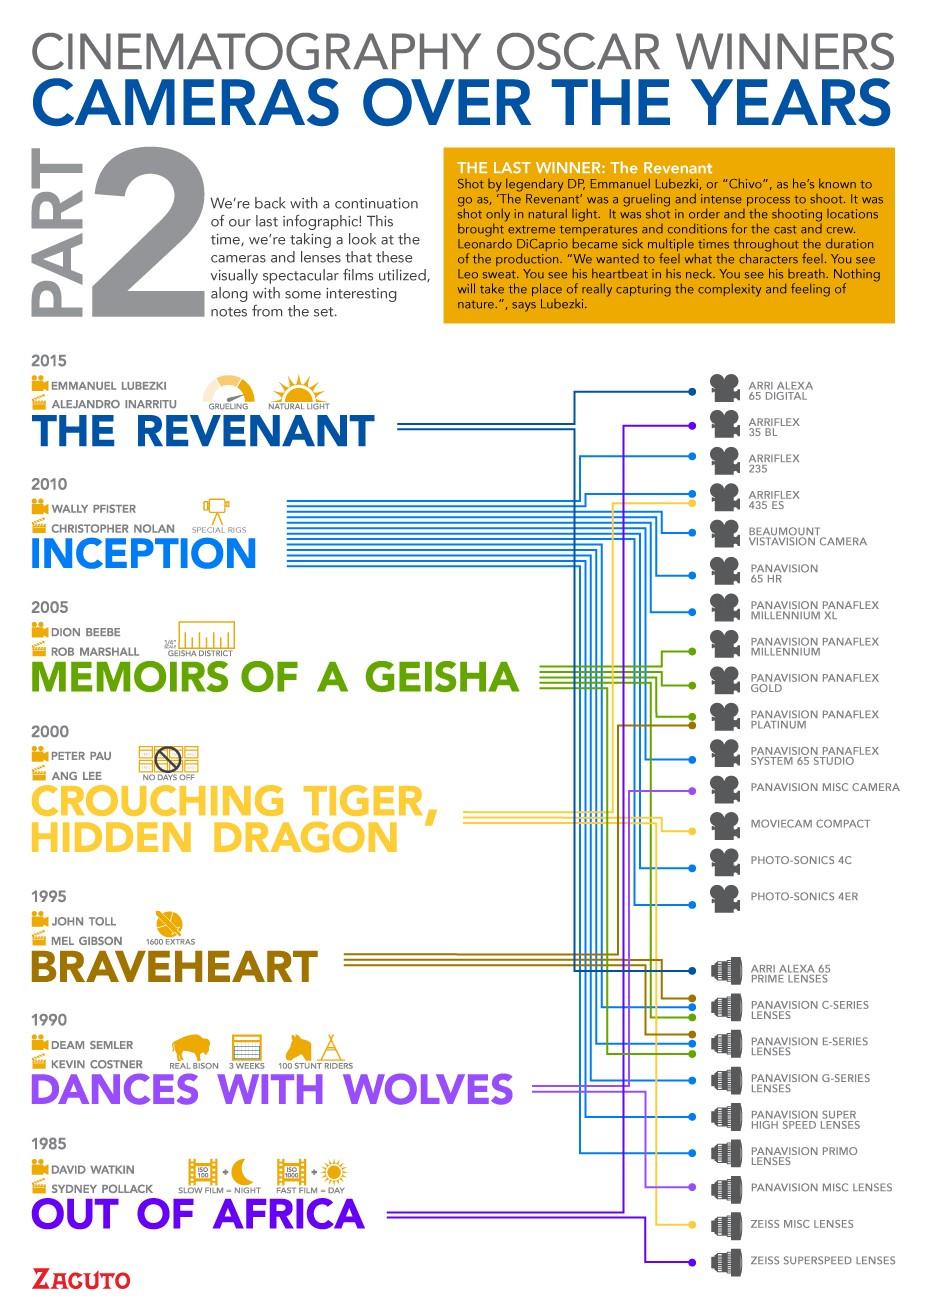 инфографика. кинокамеры